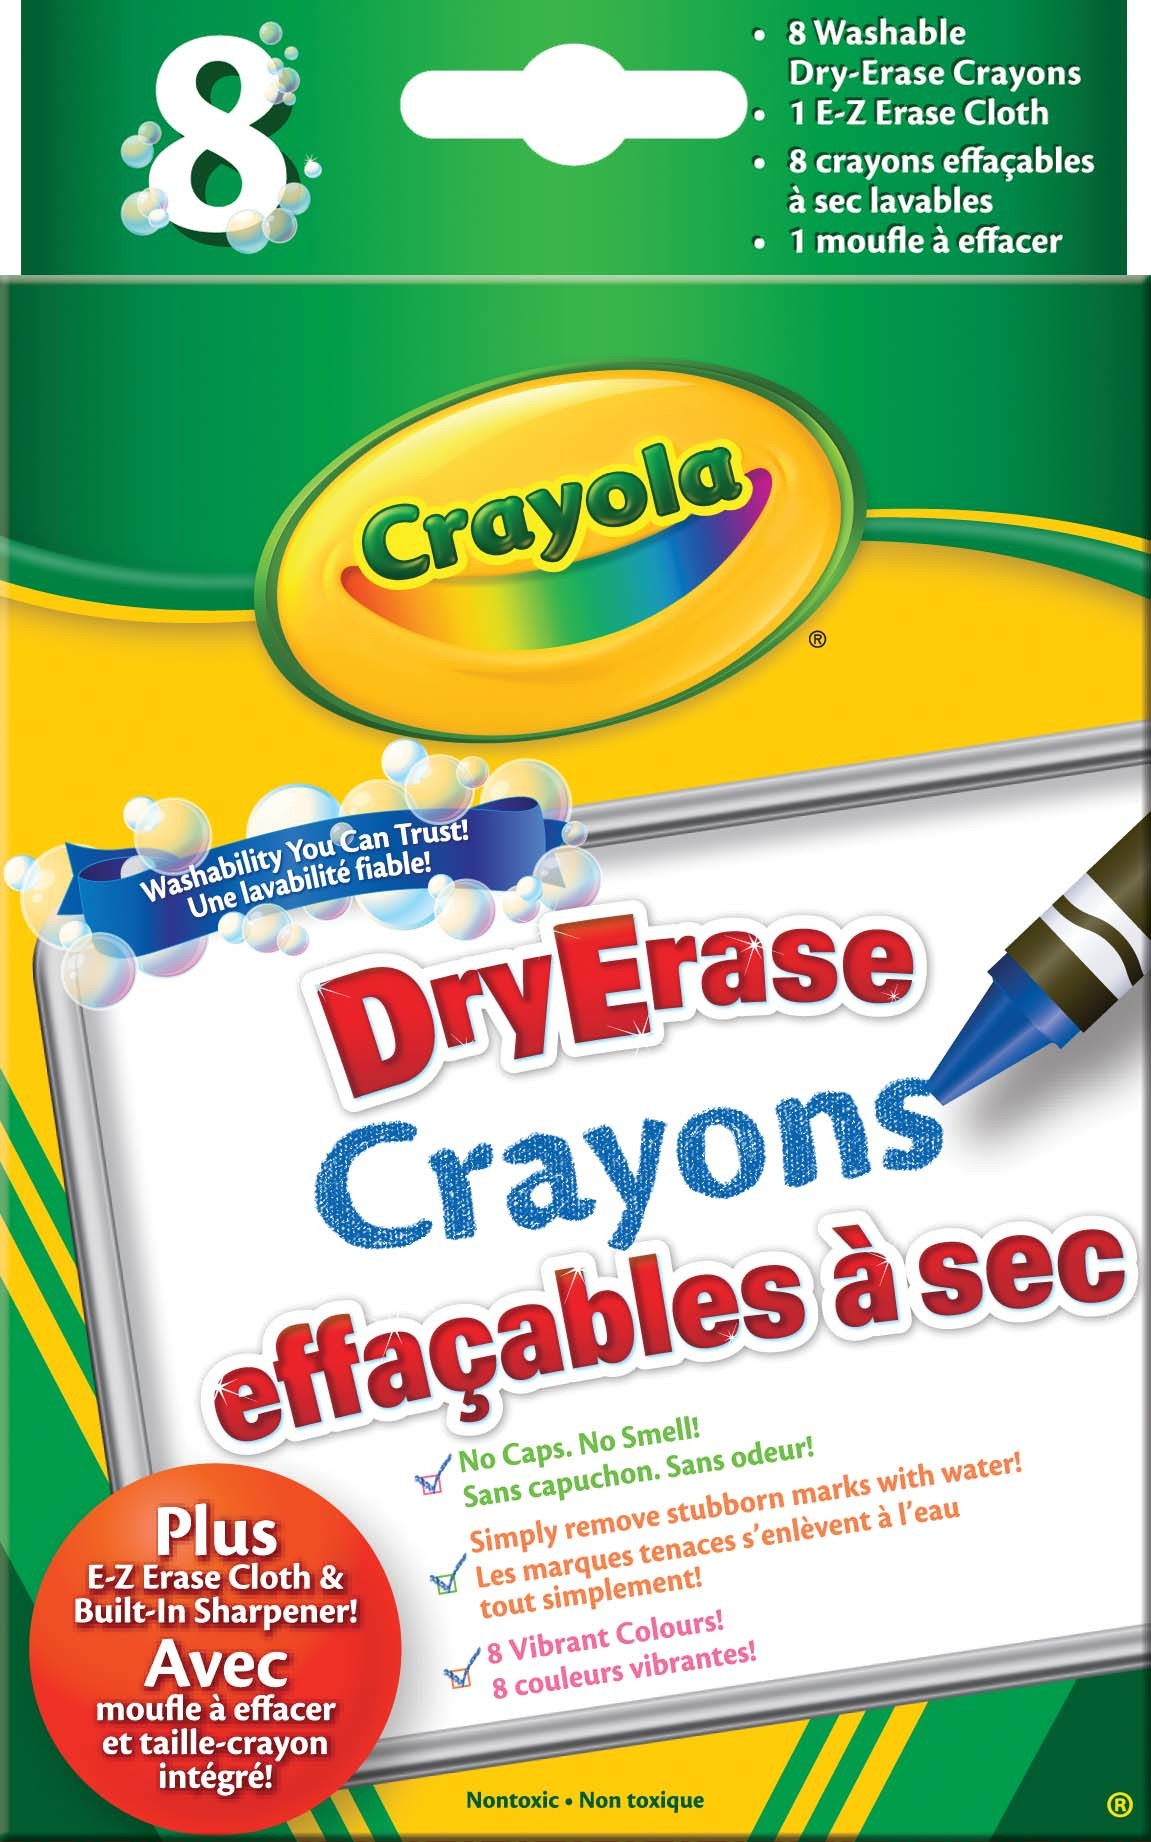 Crayola 988658 Dry Erase Crayons (for Whiteboard)